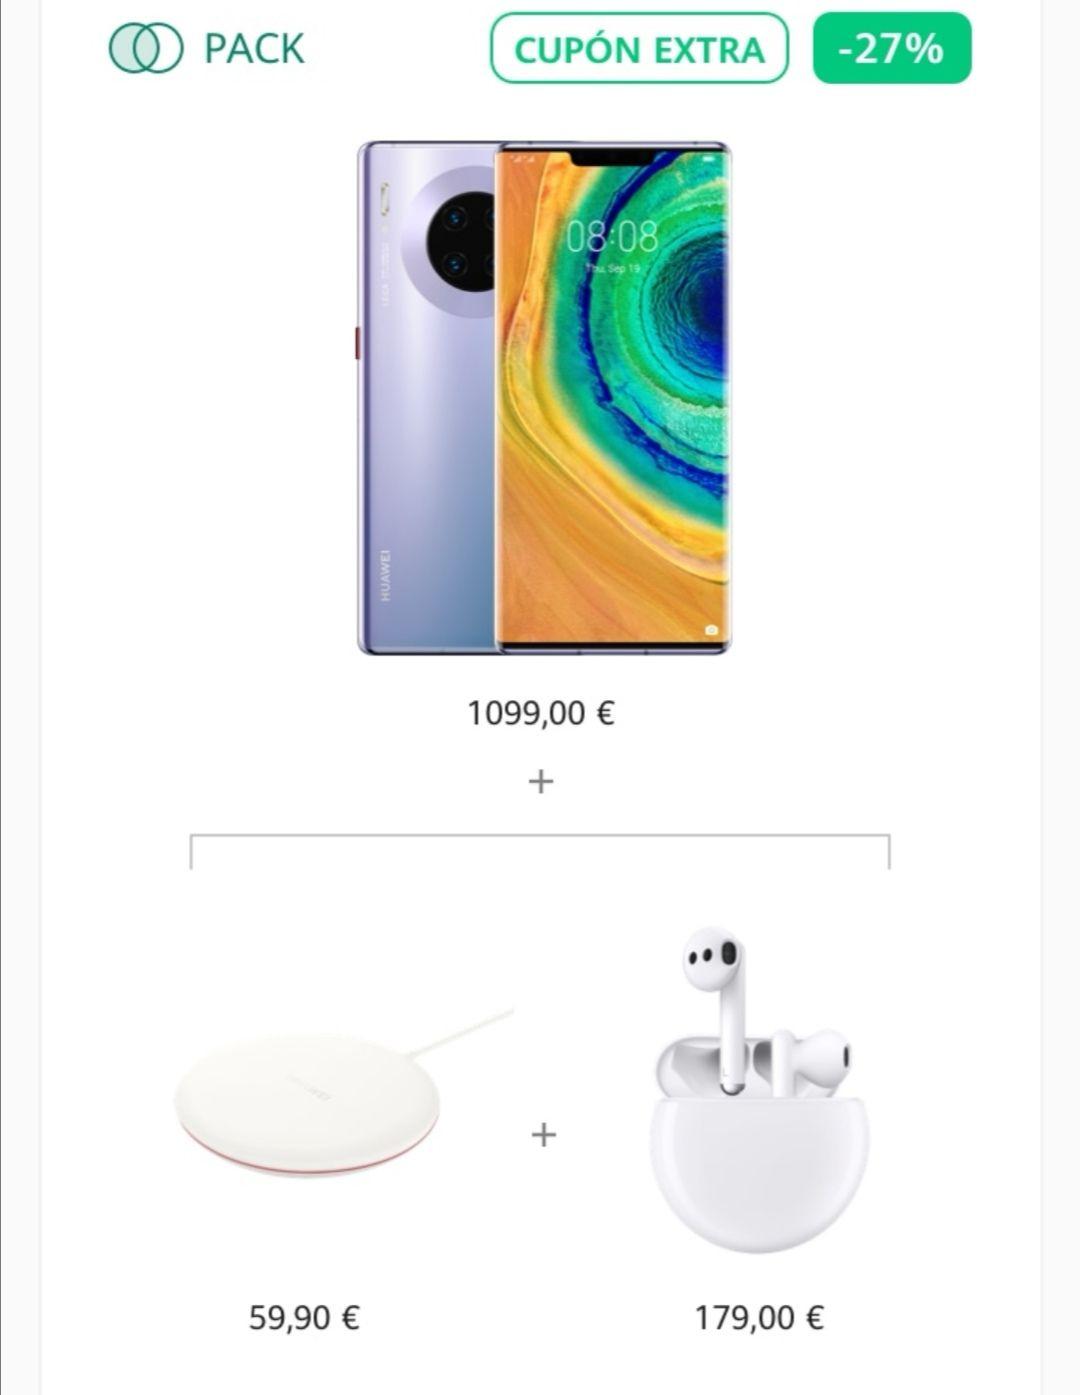 Huawei Mate 30 pro + regalo de Freebuds 3 + cargador inalambrico